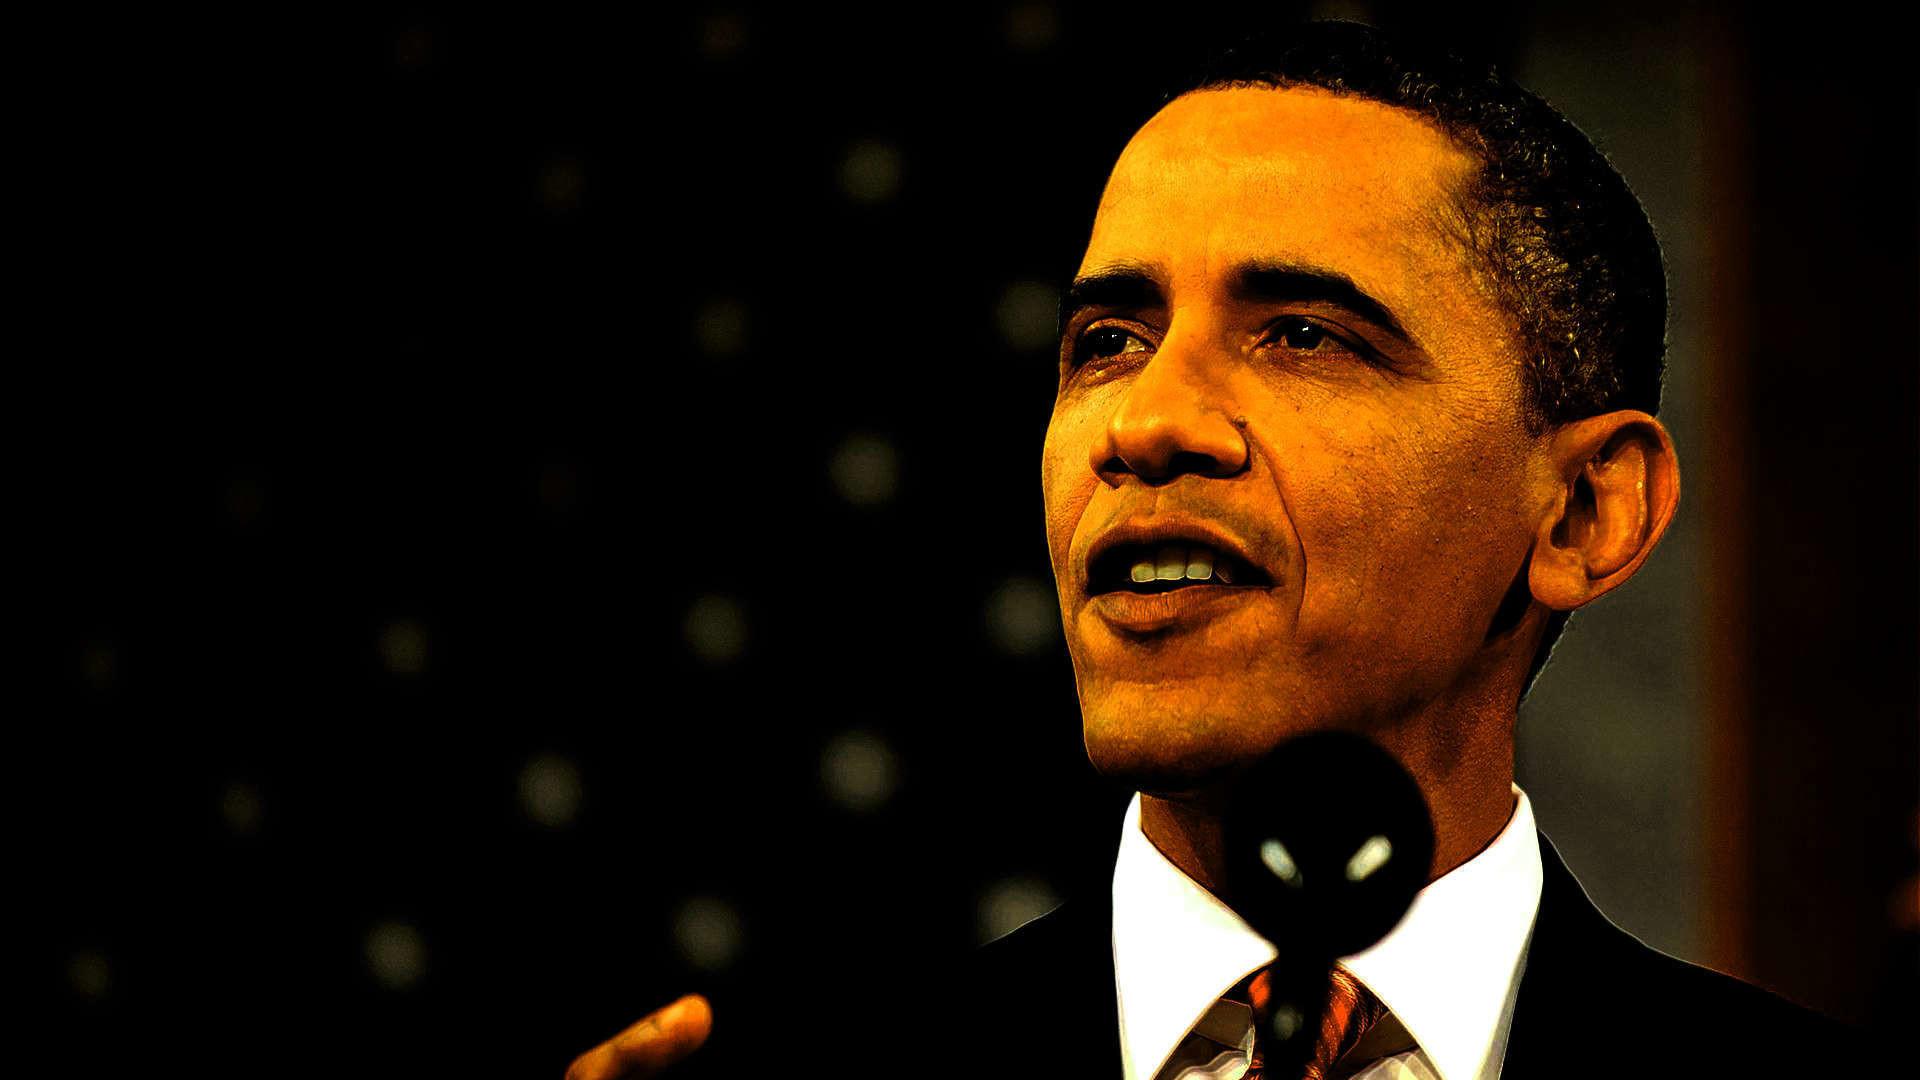 "Barack obama 2008 vs 2018 pictures Barack Obama ""Hope"" poster - Wikipedia"